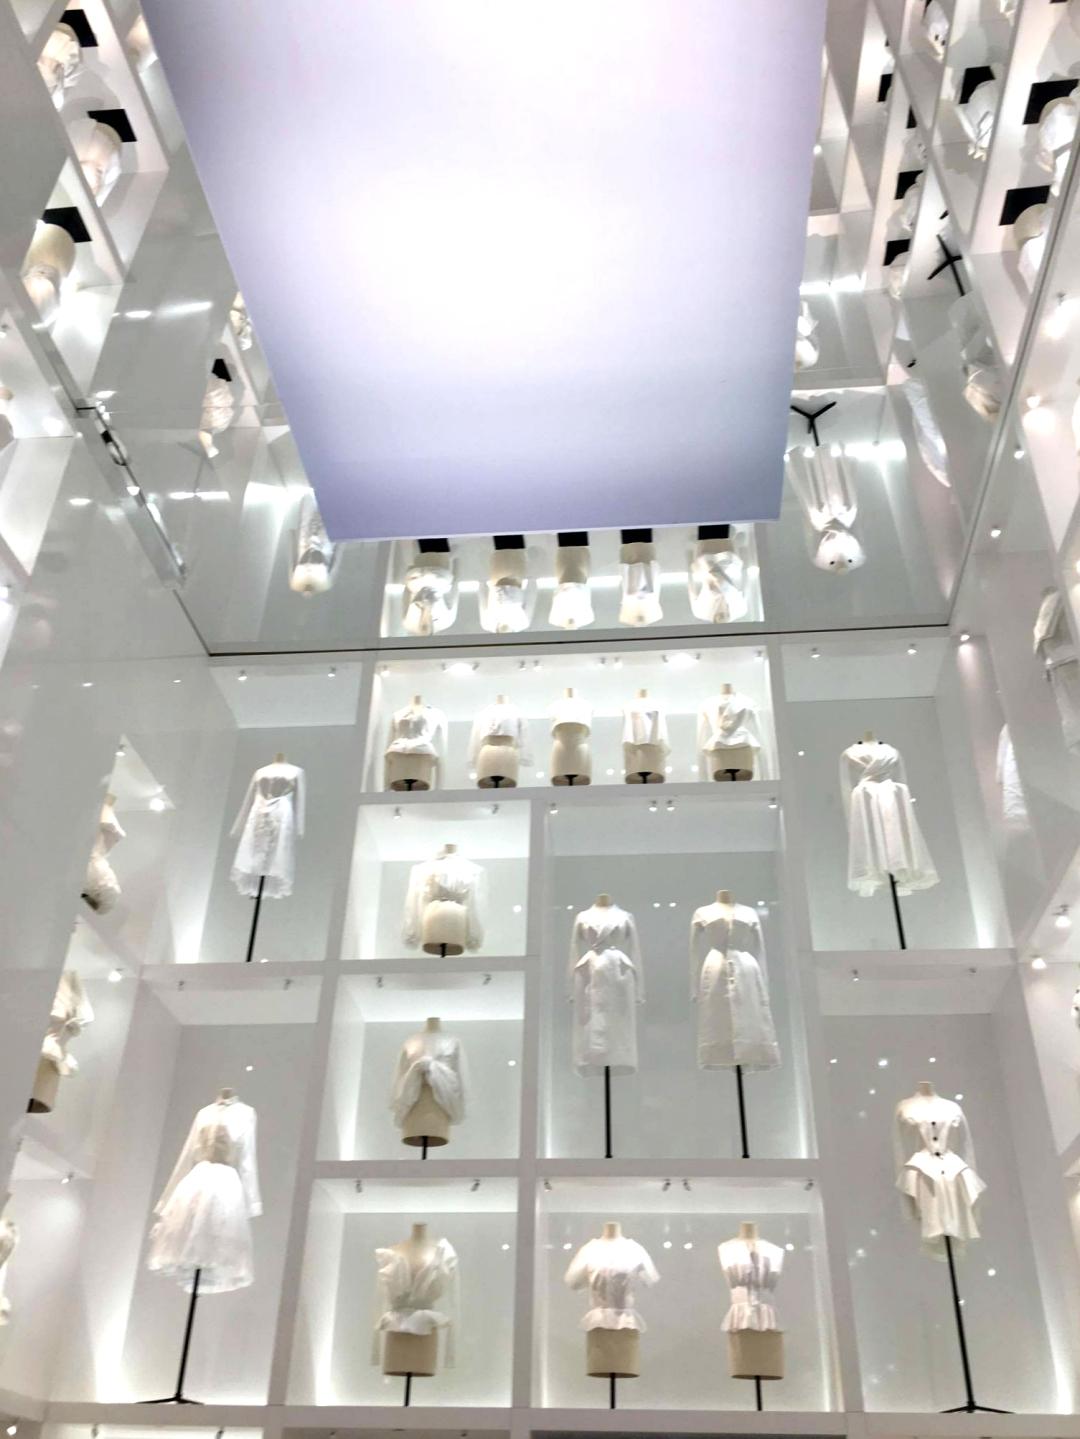 70 years Dior - Dior Paris - Dior collection